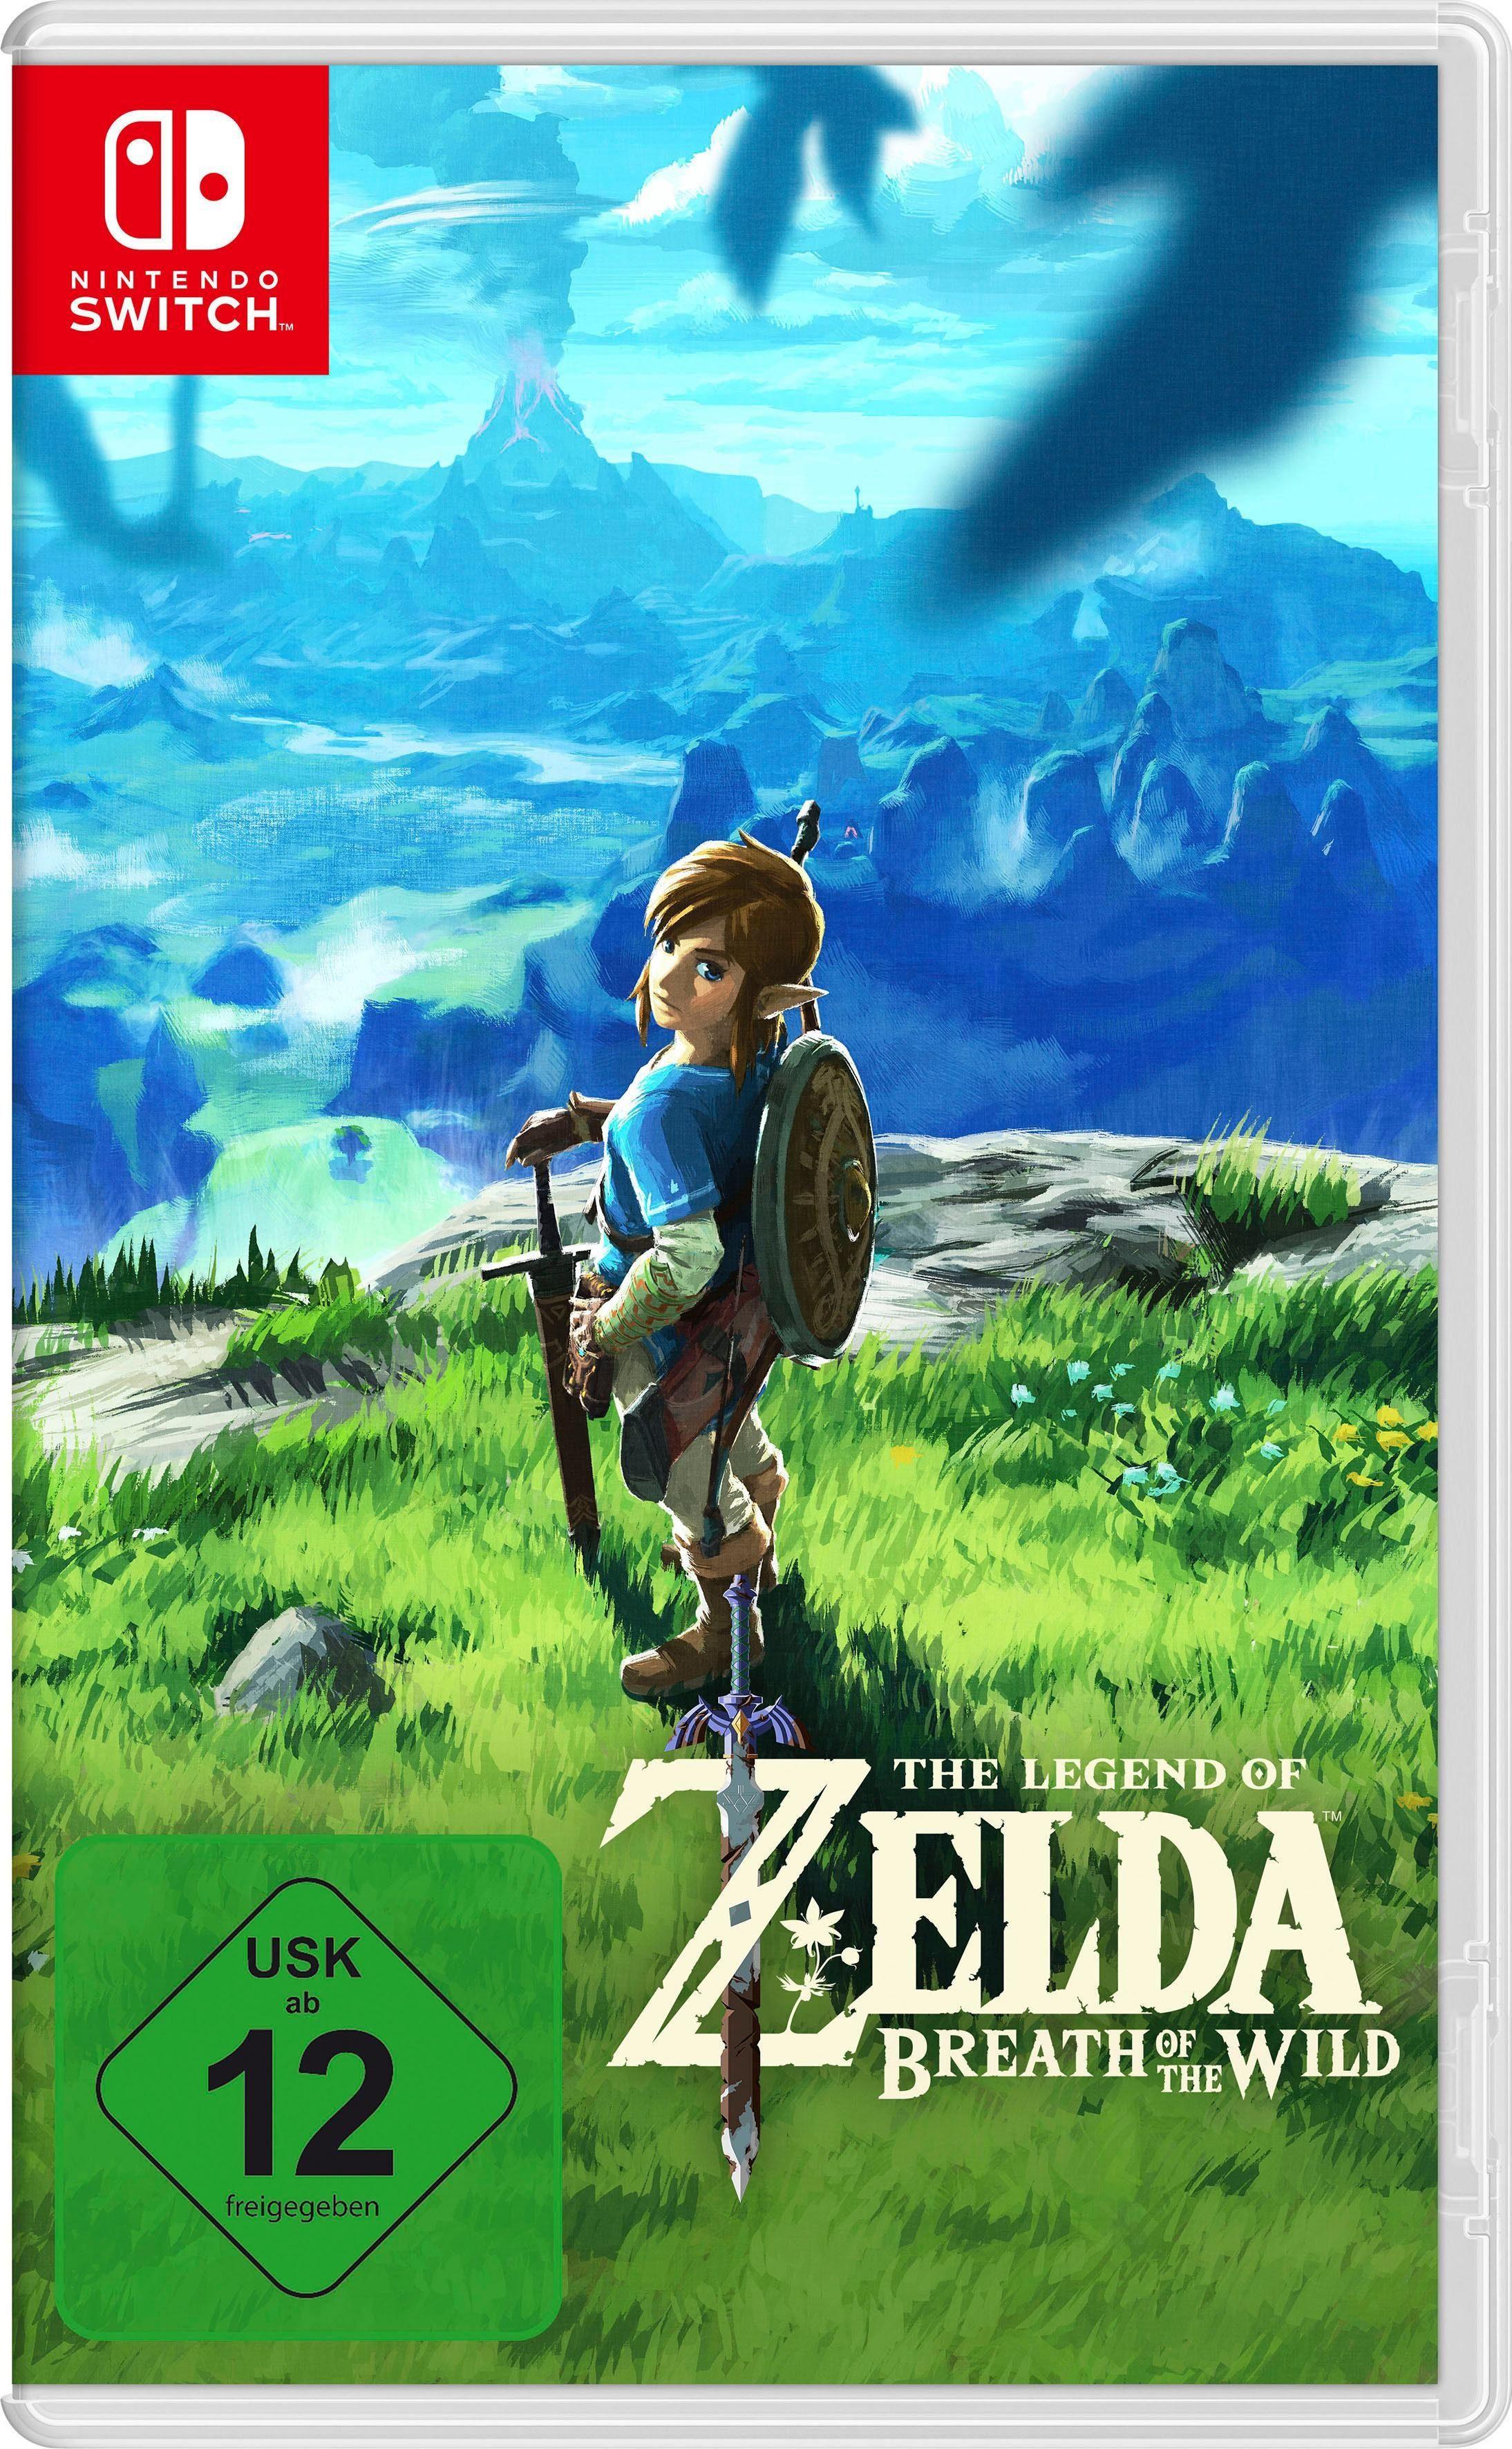 The Legend of Zelda: Breath of the Wild Nintendo Switch